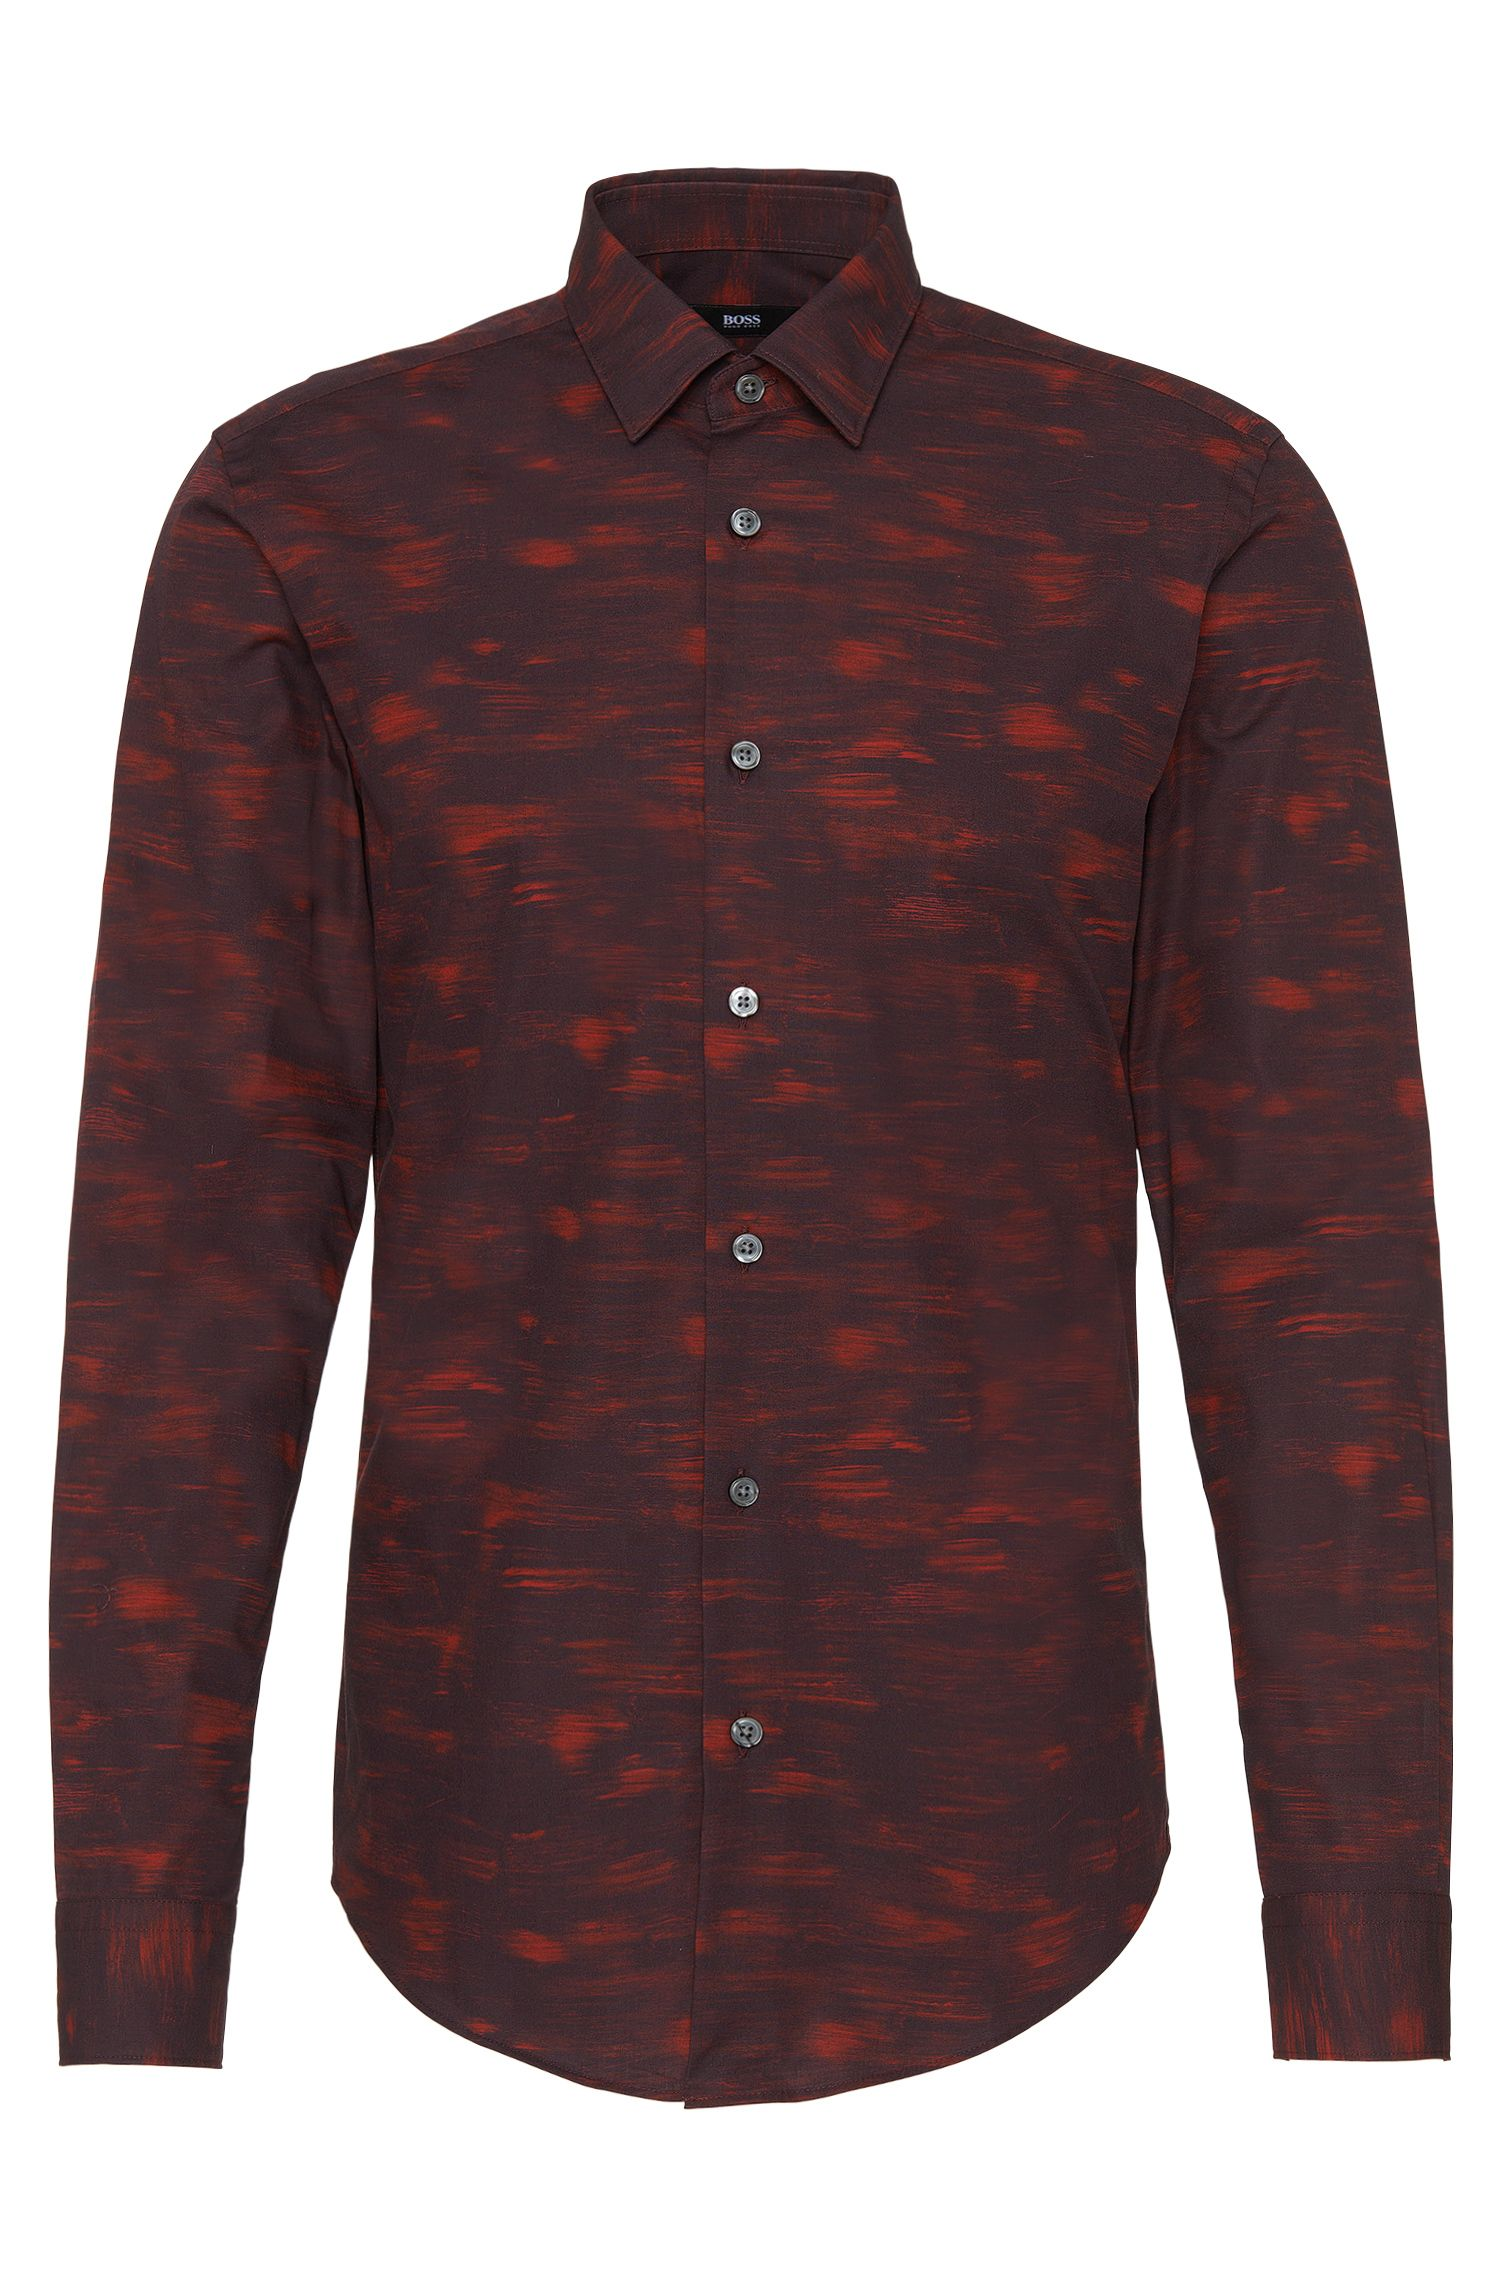 Gemustertes Slim-Fit Hemd aus Baumwolle: 'Ronni_F'